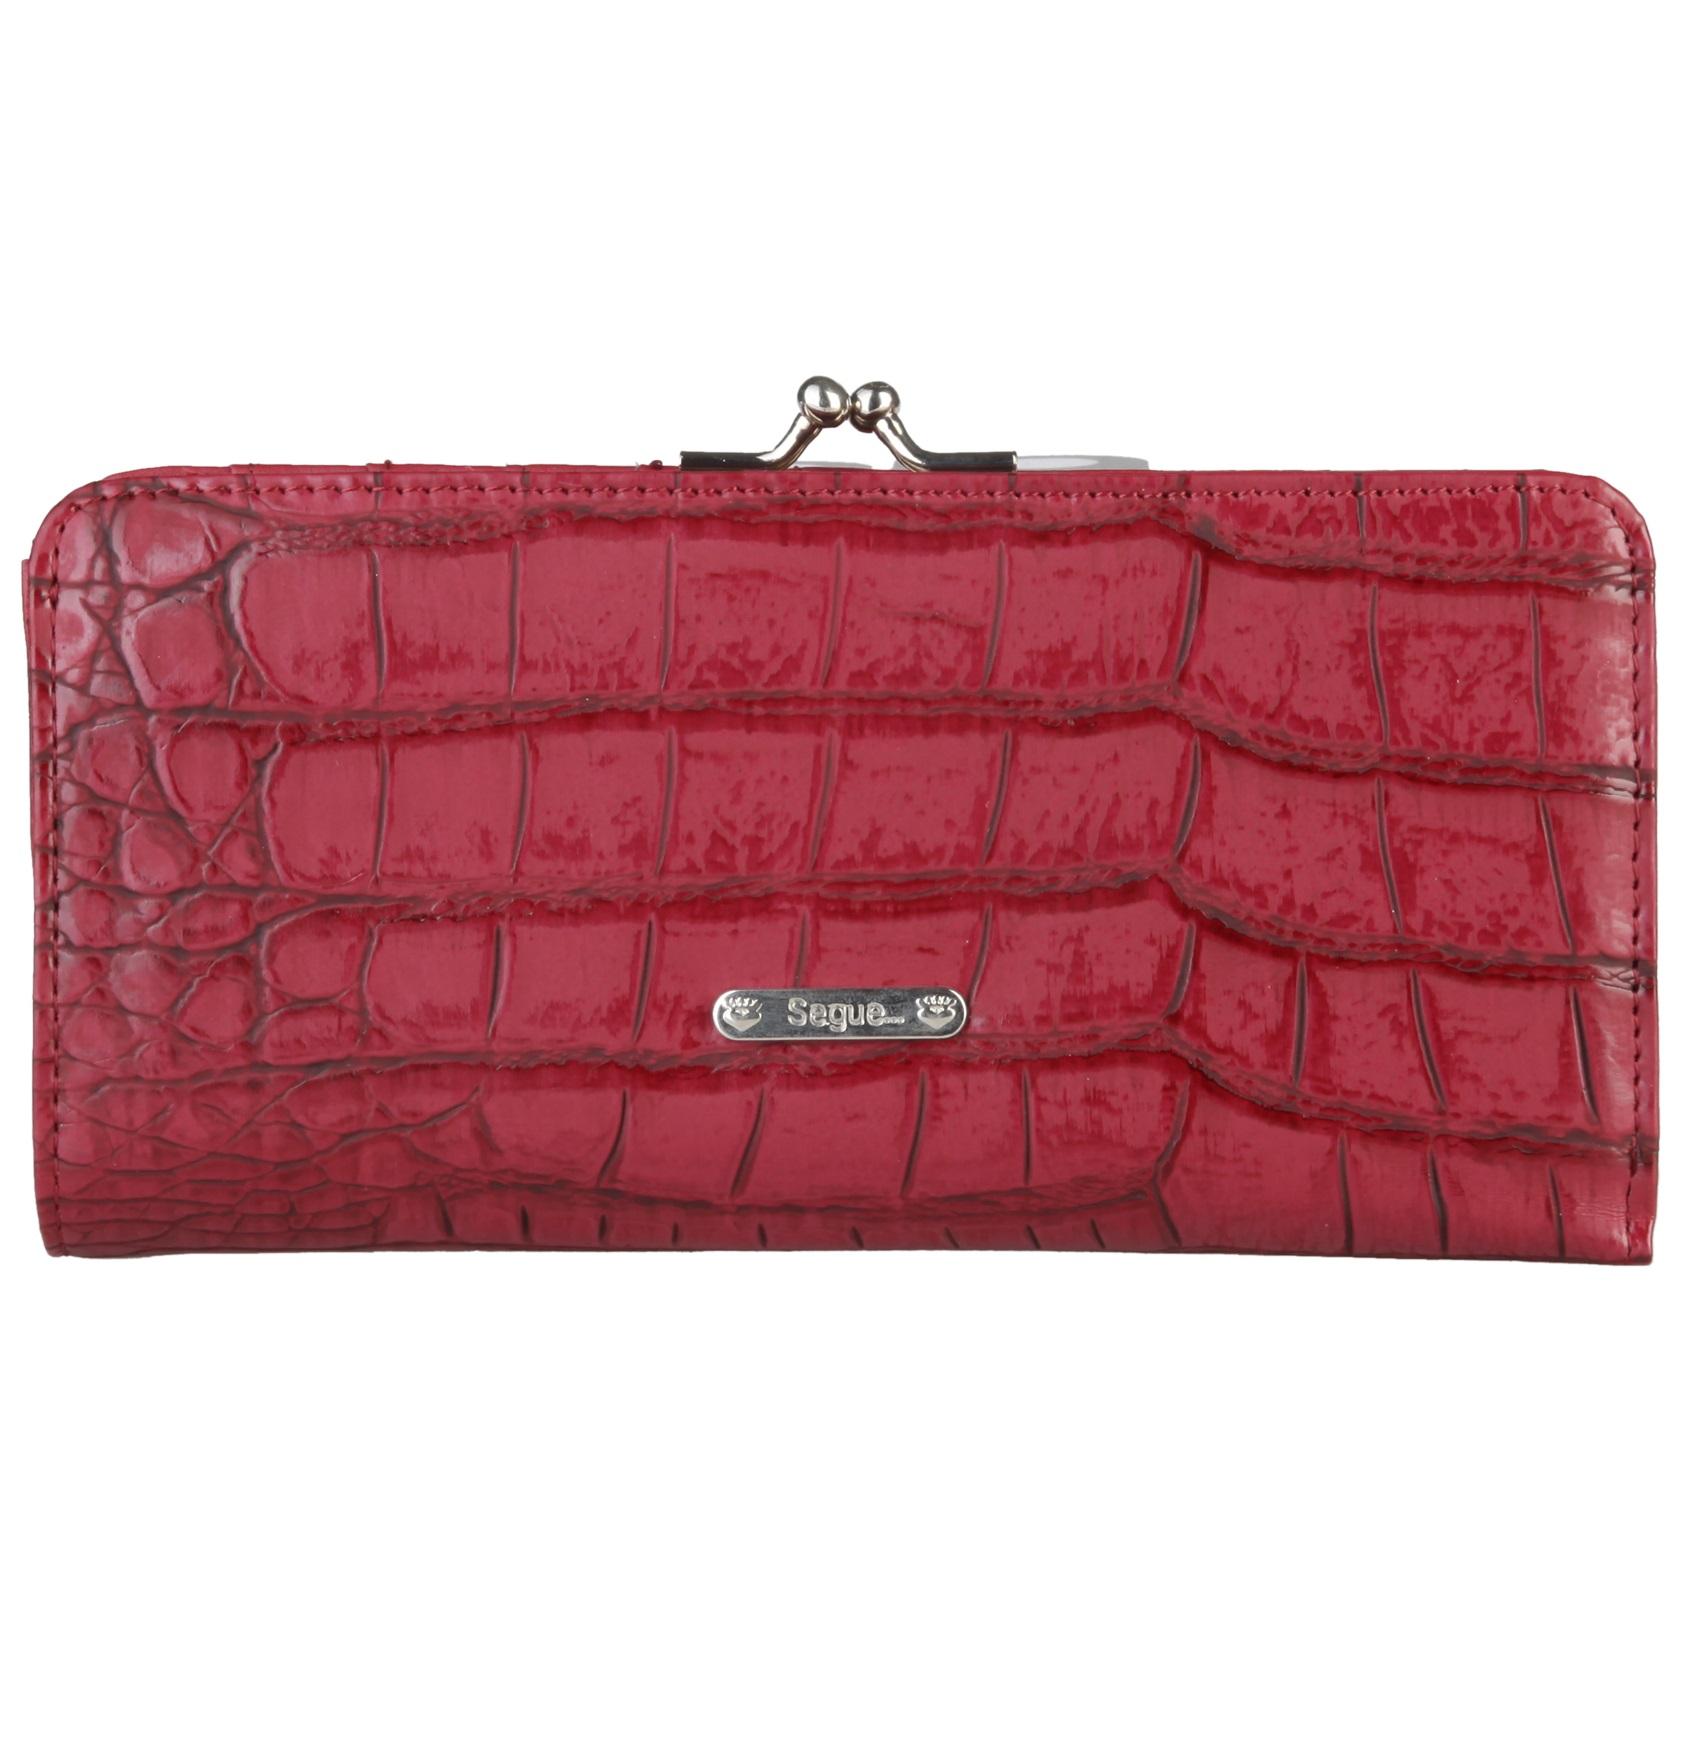 Segue Wallet Red Rf600119